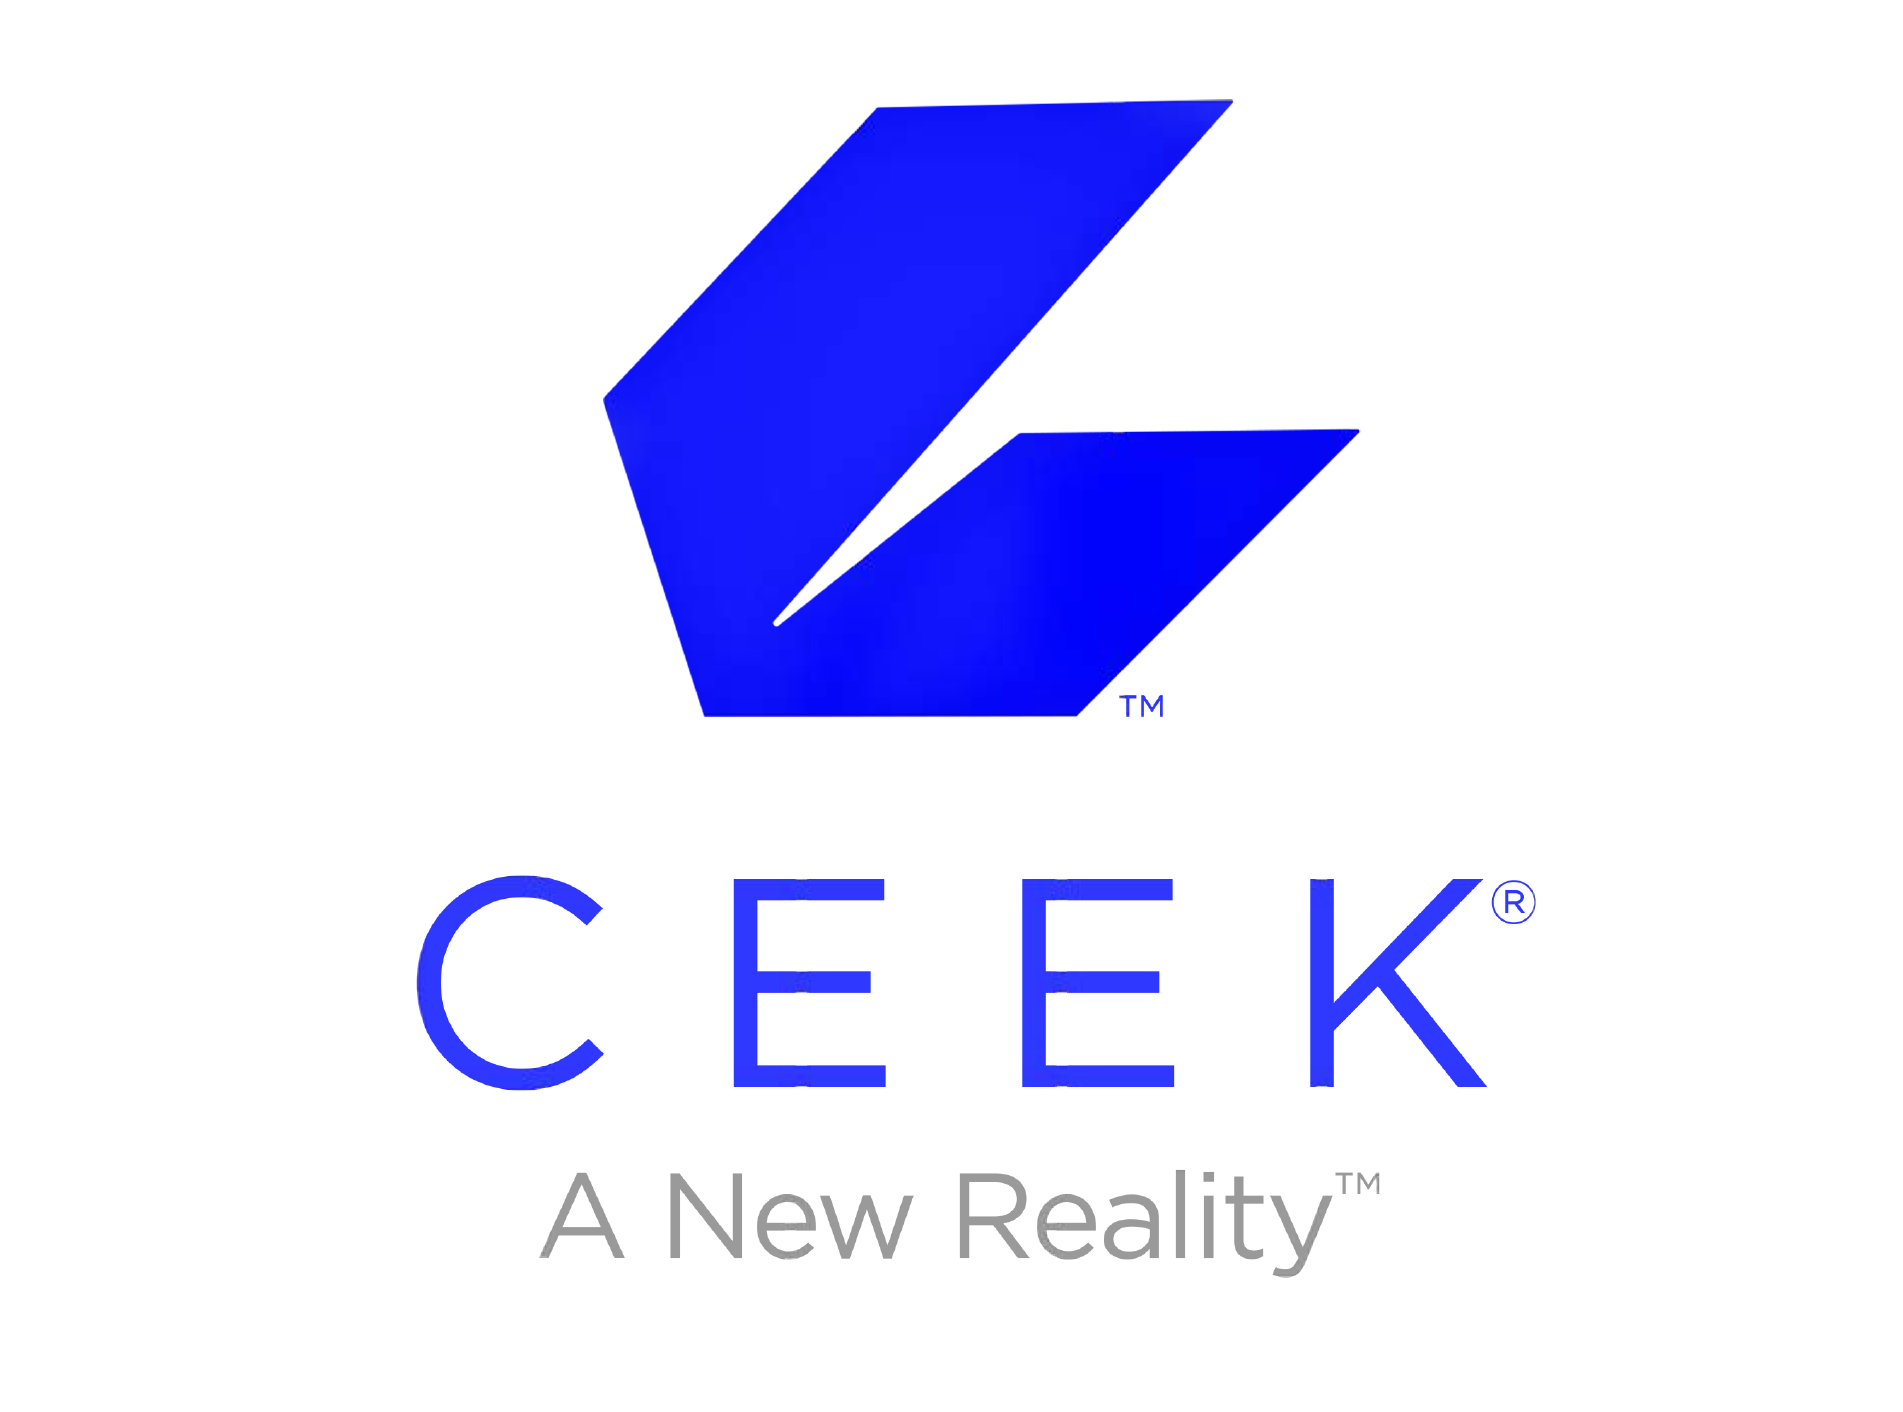 CEEK VR INC